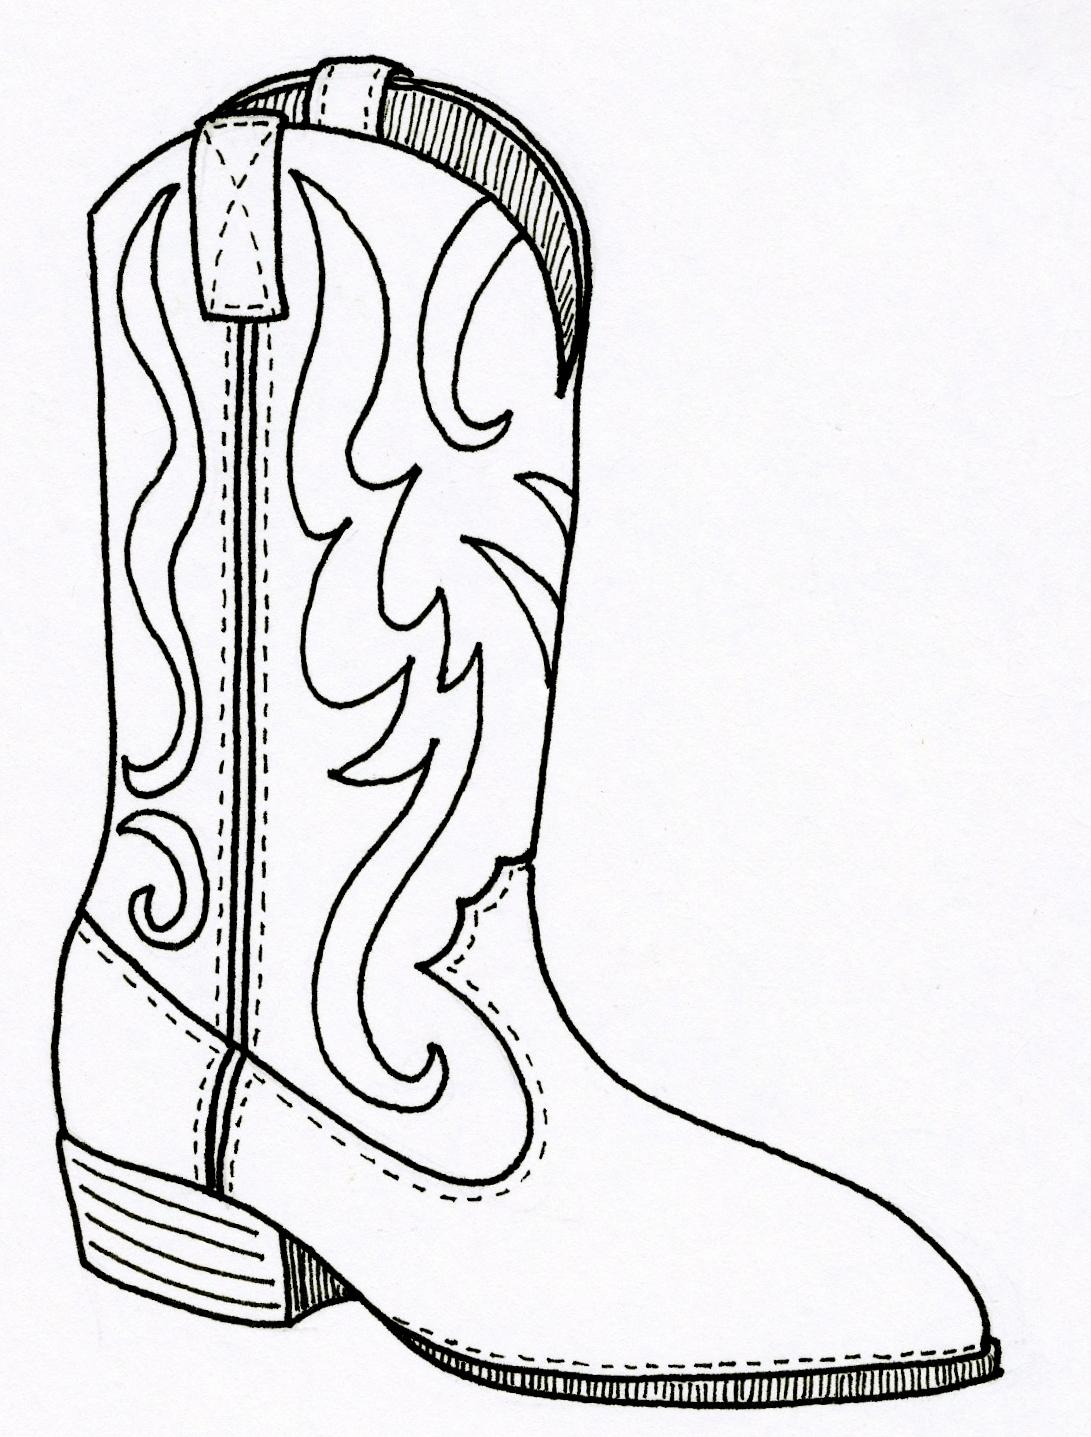 Cowboy Boot Harness Straps Auto Electrical Wiring Diagram 1999 Infiniti Q45 Fuse Box Fuel Filter Lawn Boy Snowblower Phone Jack 2010 2016 Passat Stereo